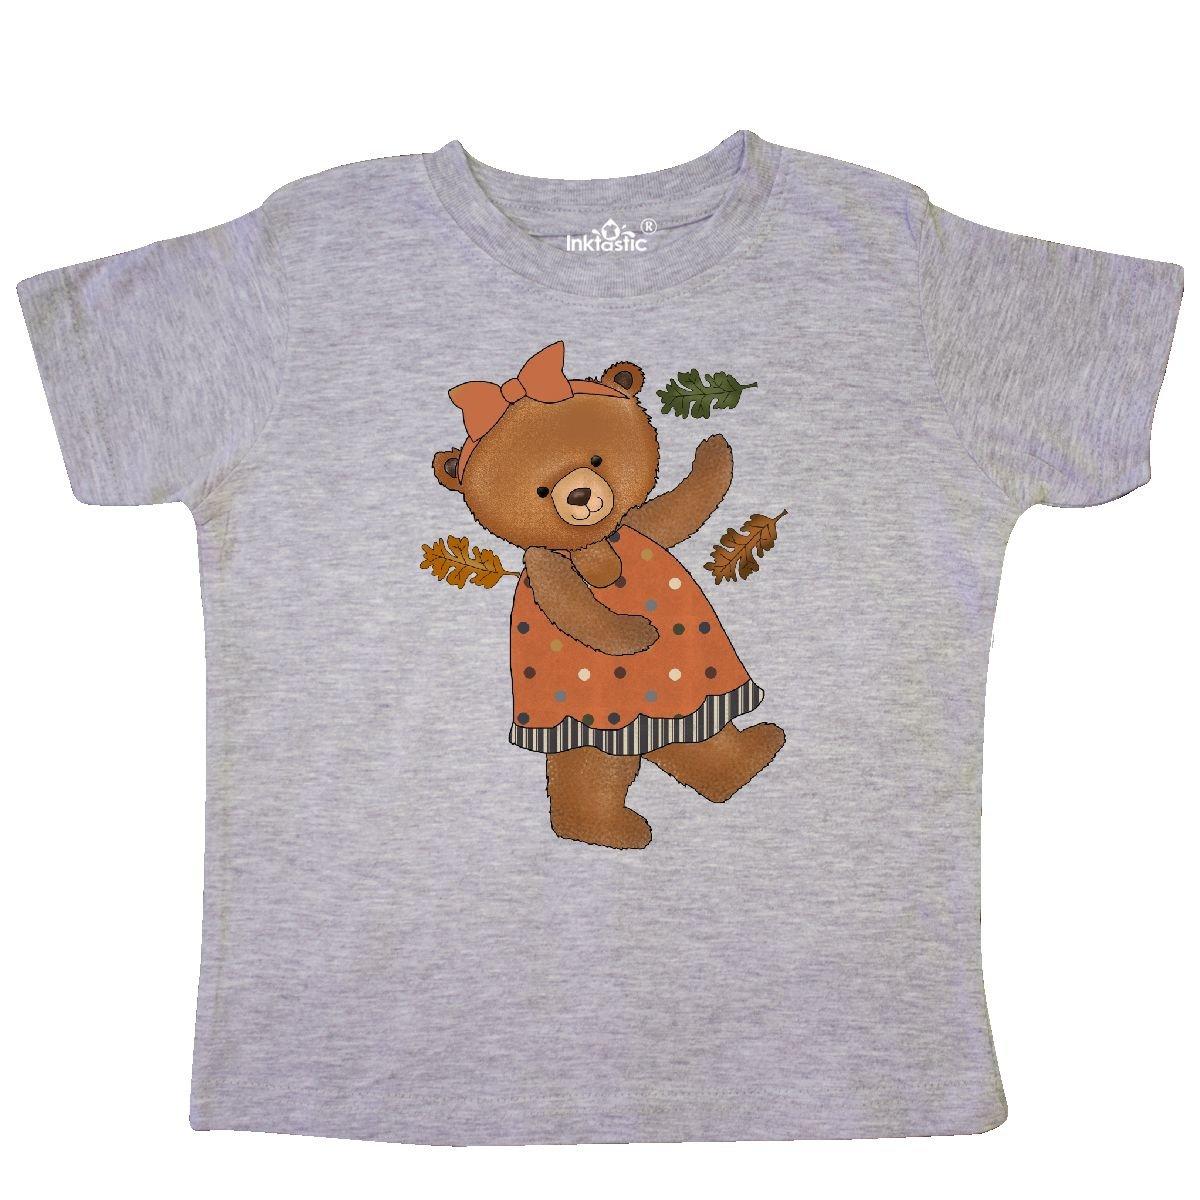 inktastic Little Miss Fall Teddy Toddler T-Shirt